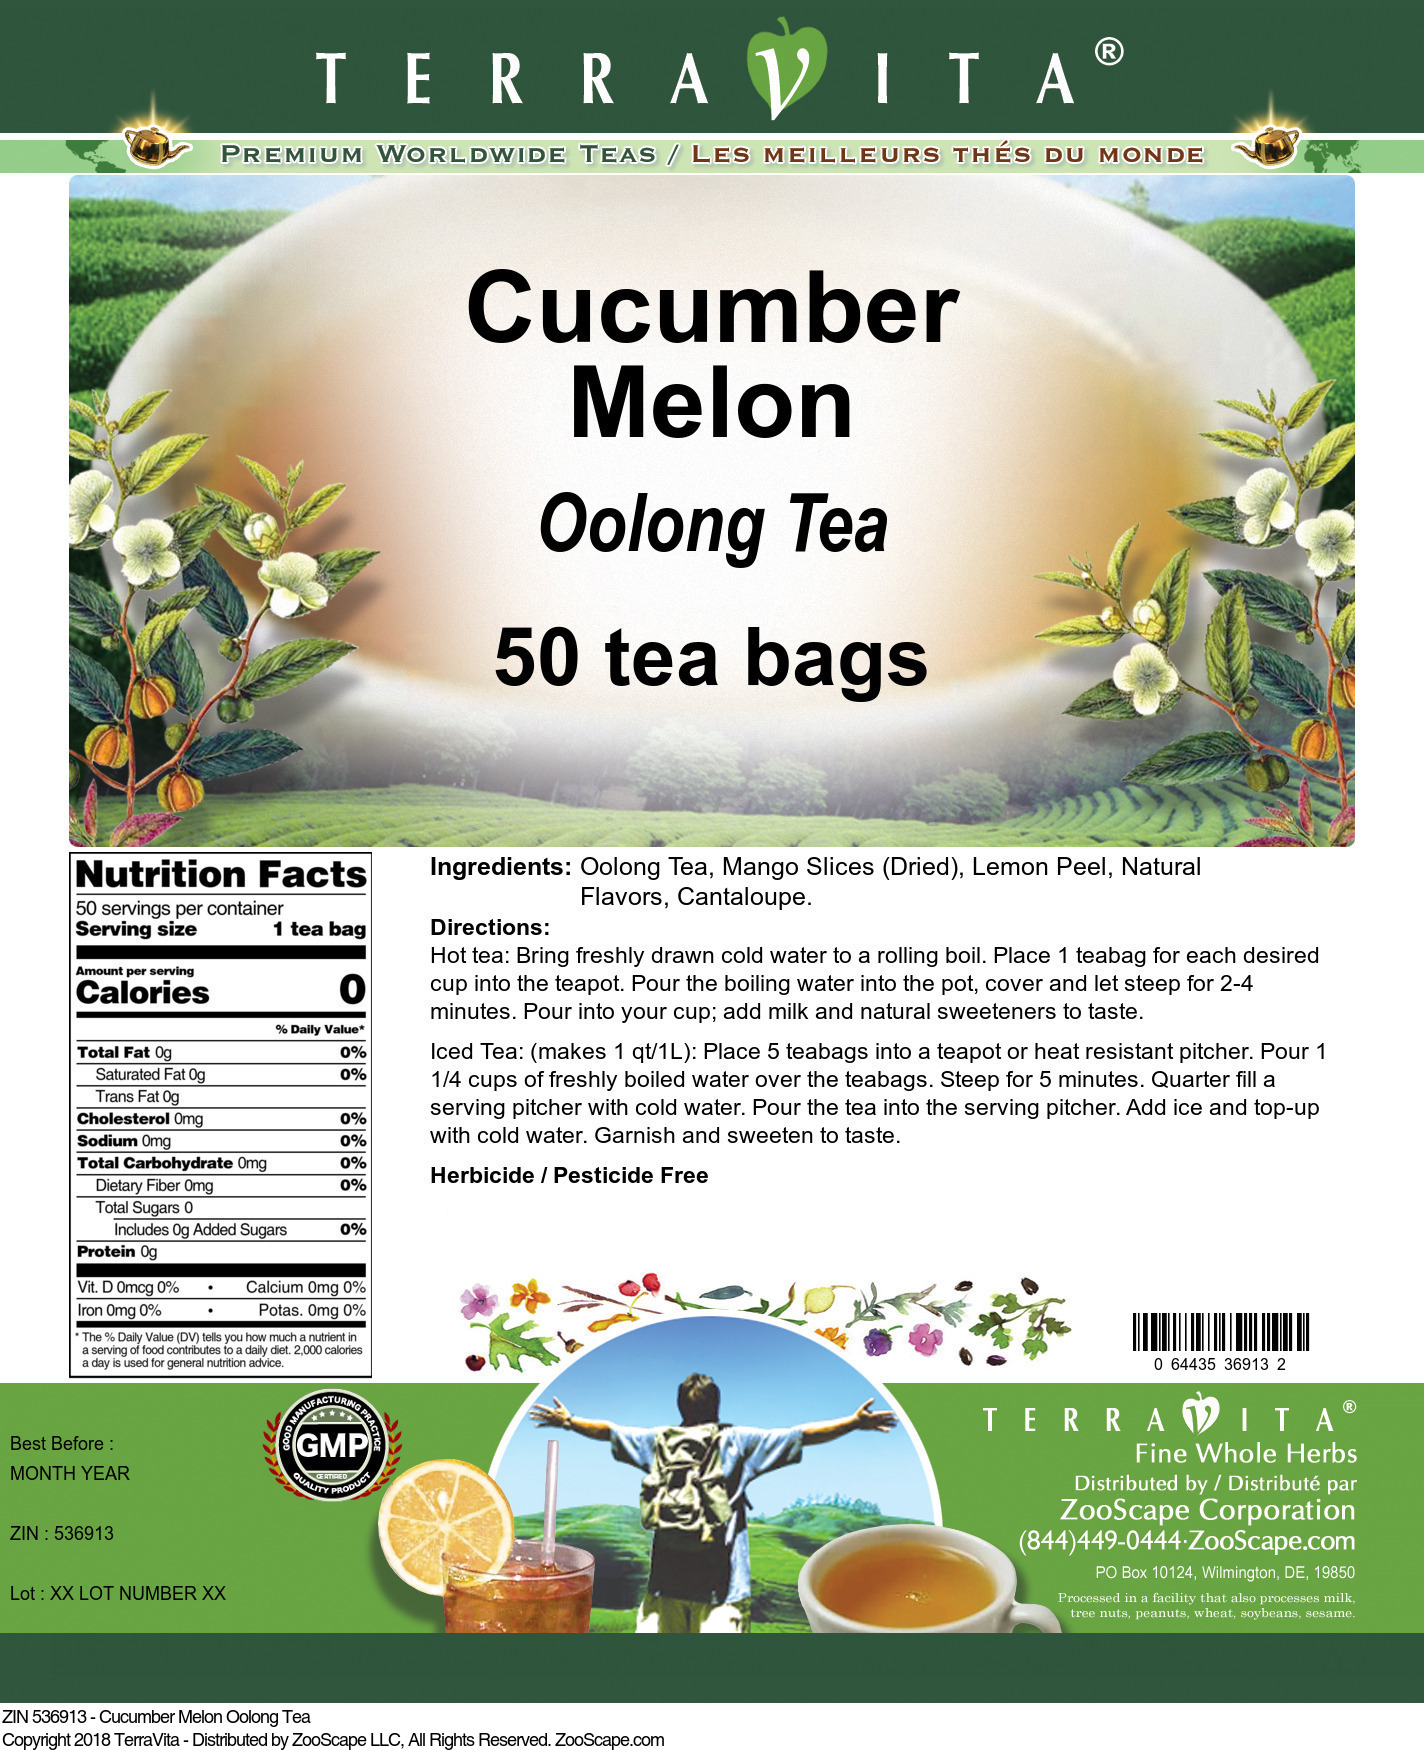 Cucumber Melon Oolong Tea